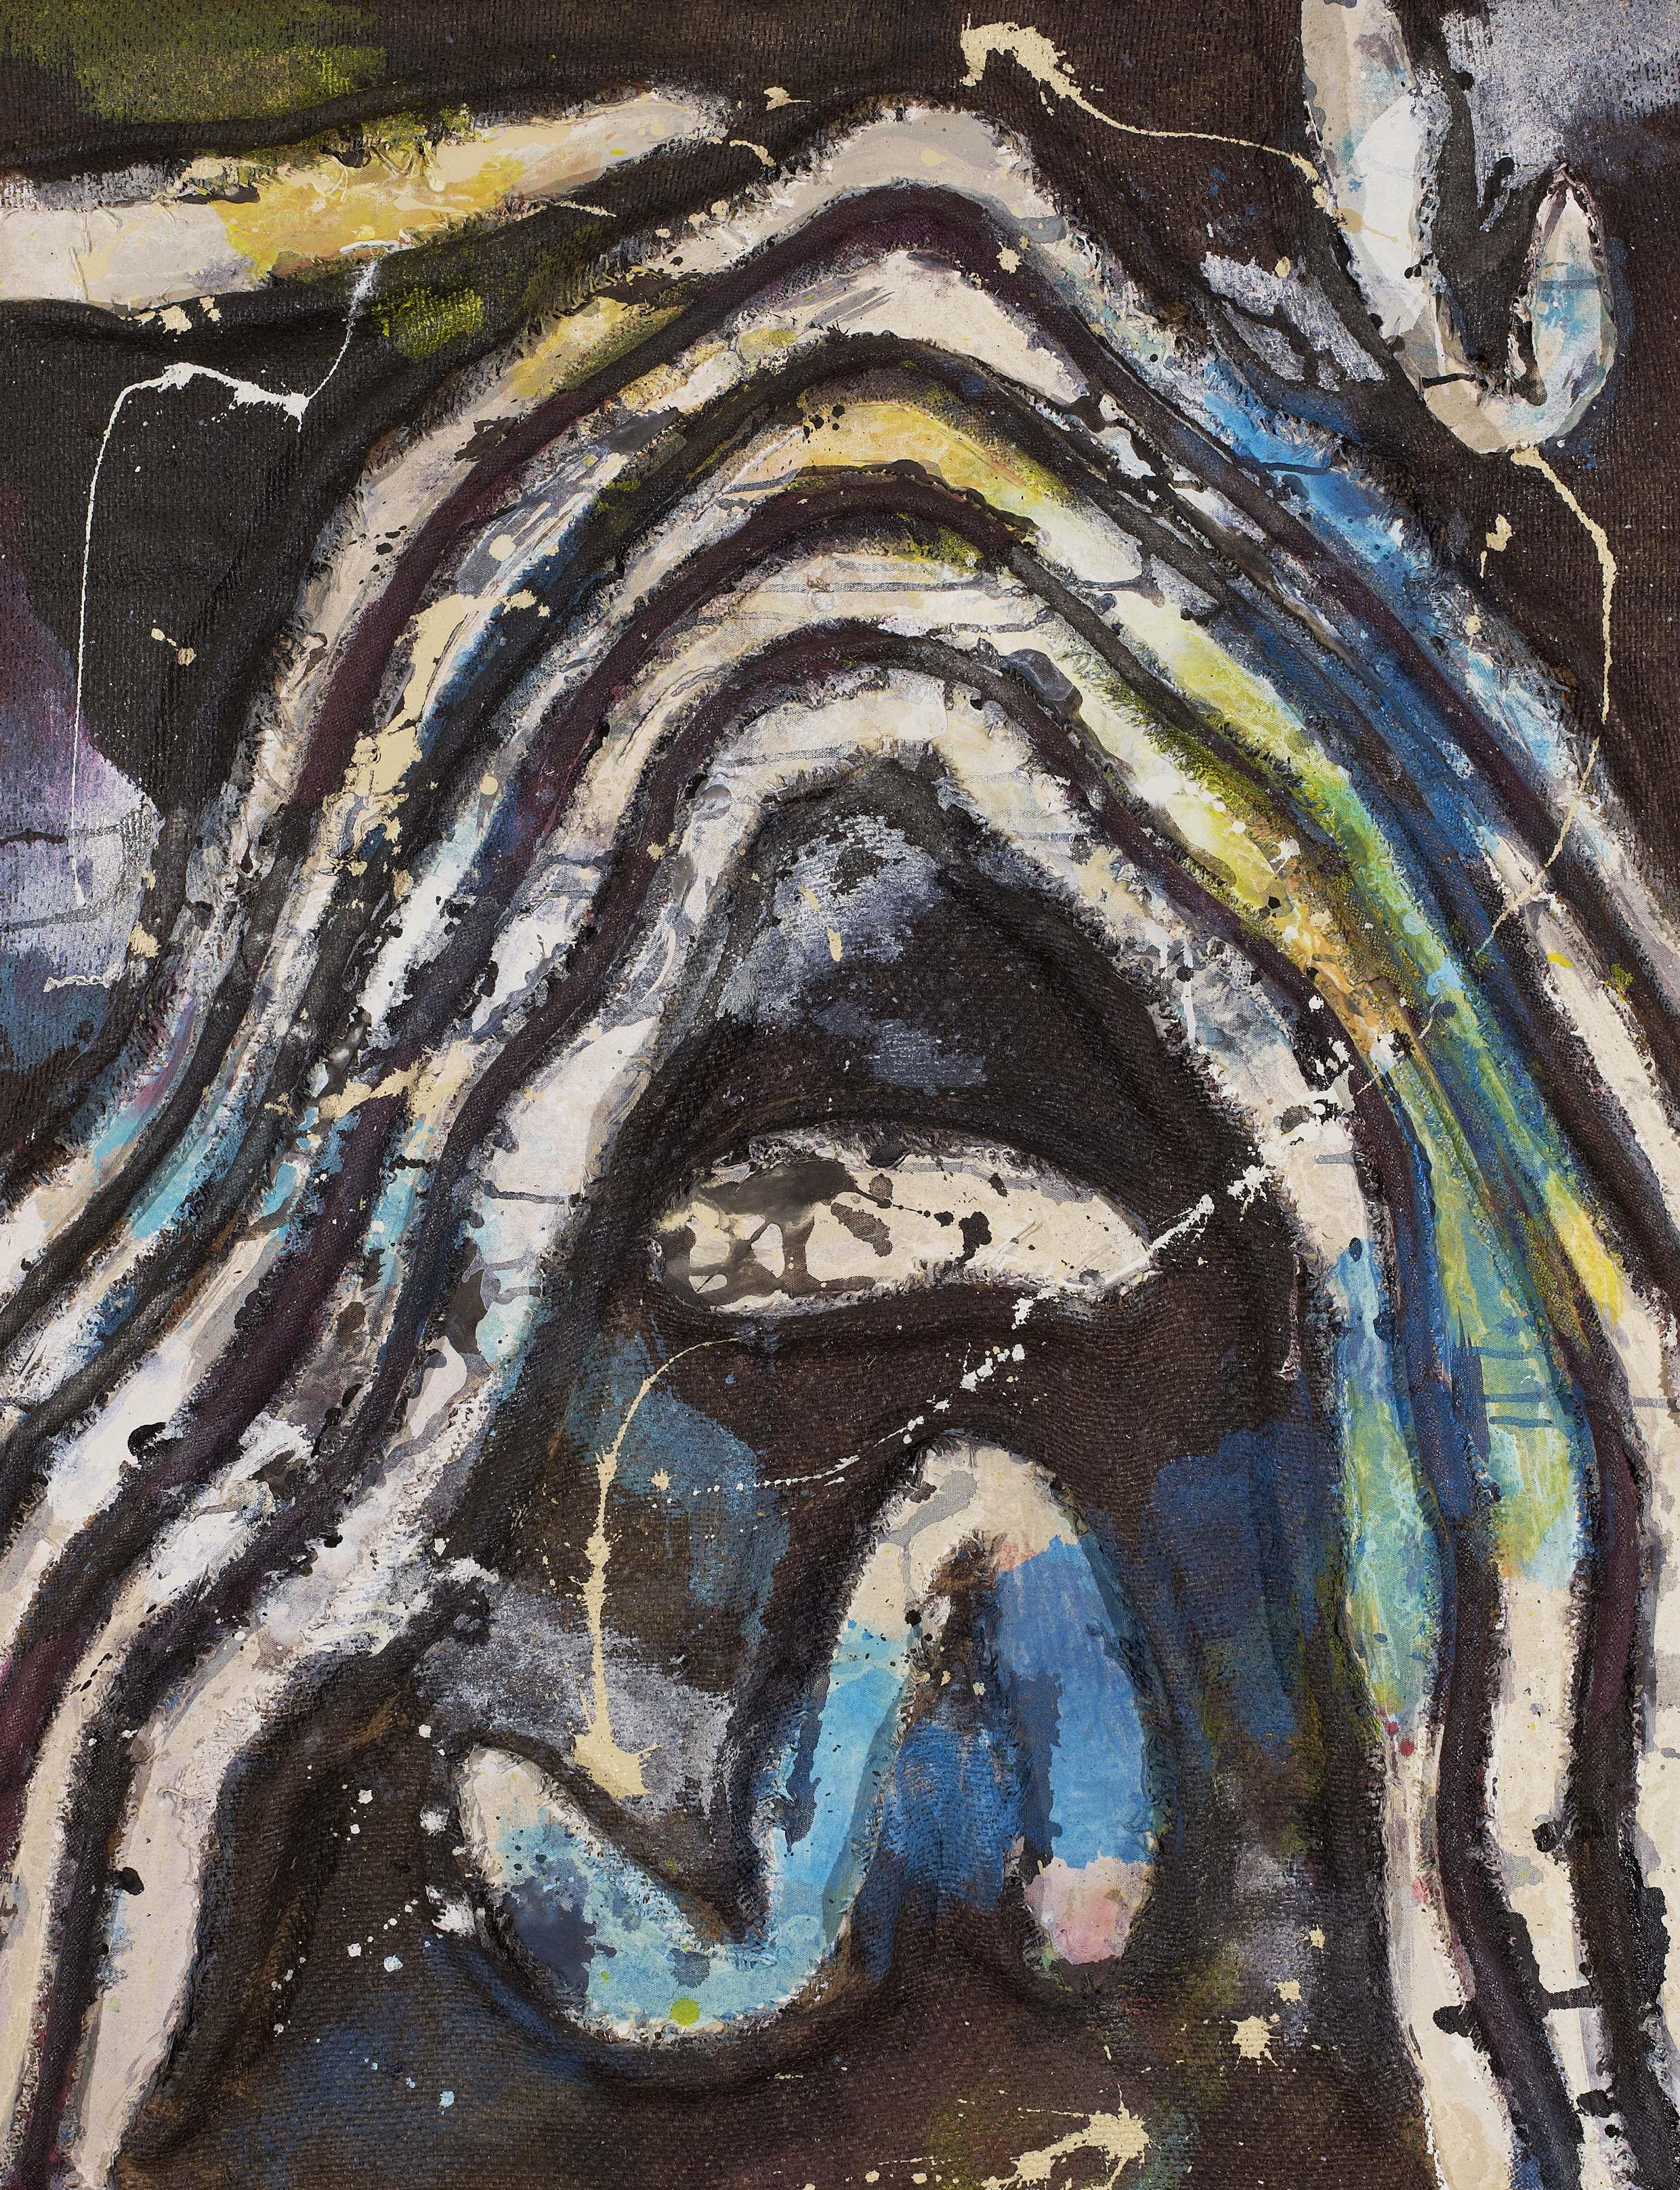 Tsuyoshi Maekawa, Work 140629, 2014, 116 x 89 cm, Jute et huile sur toile